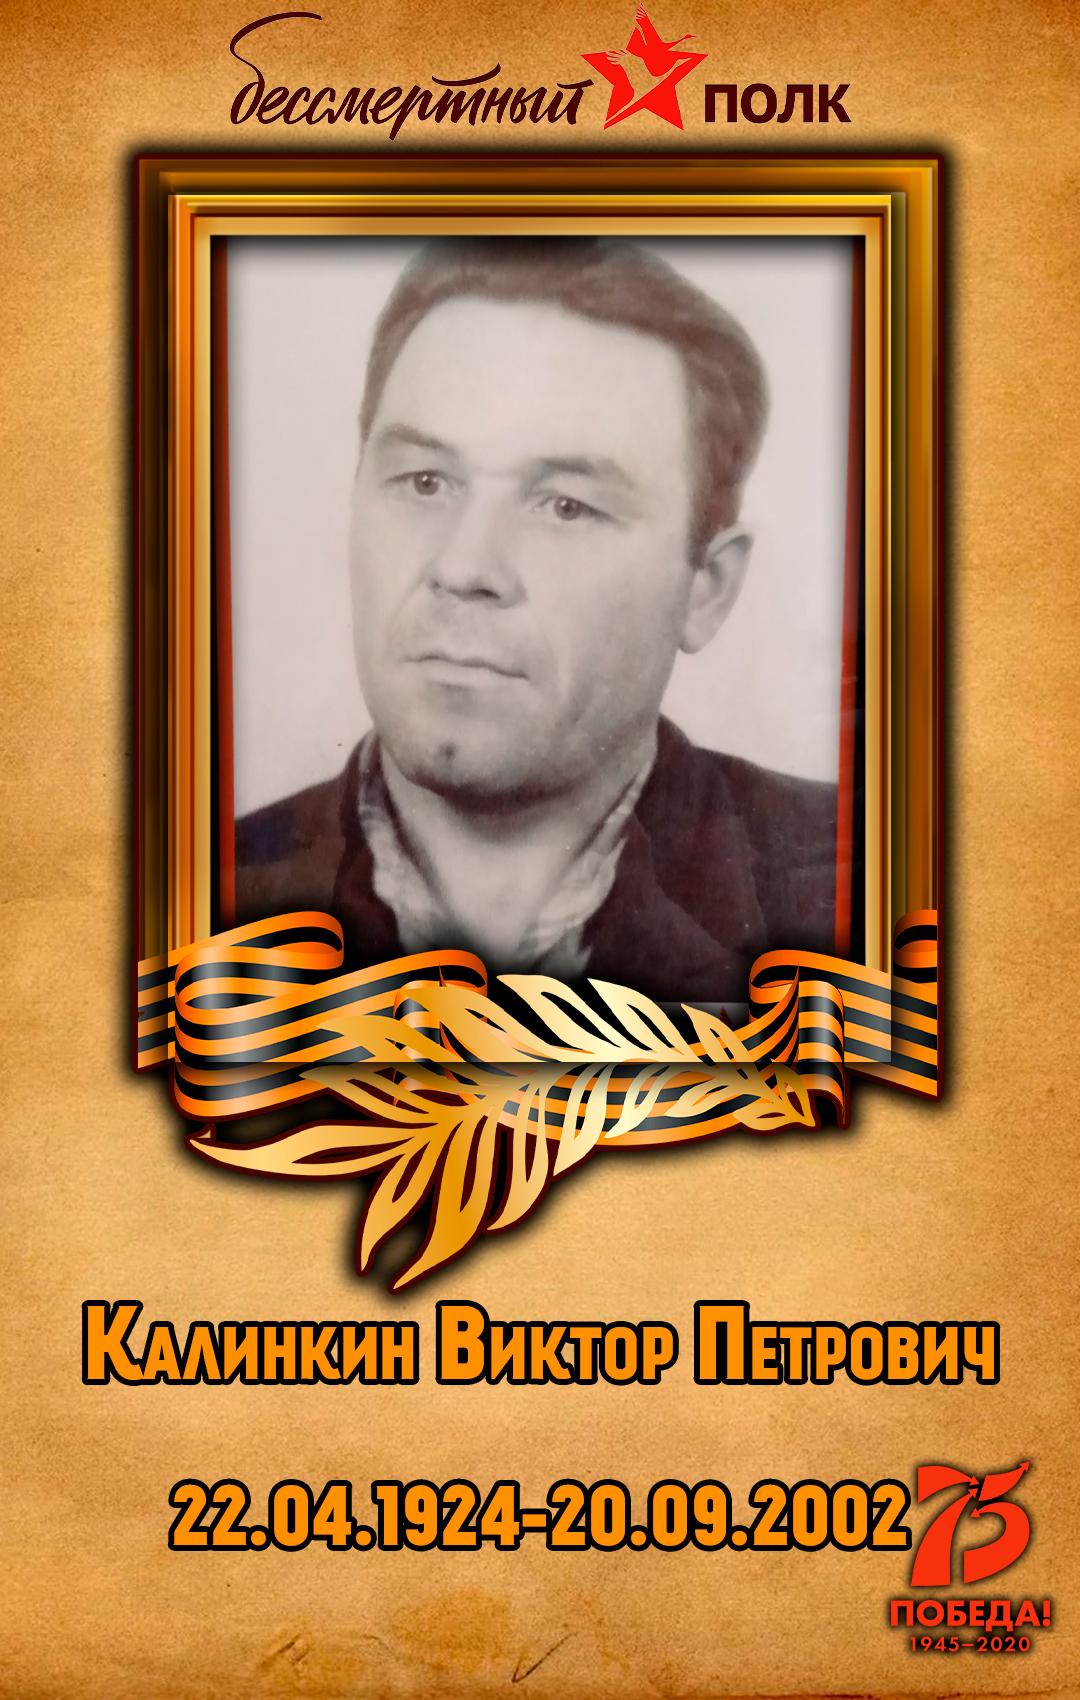 Калинкин-Виктор-Петрович